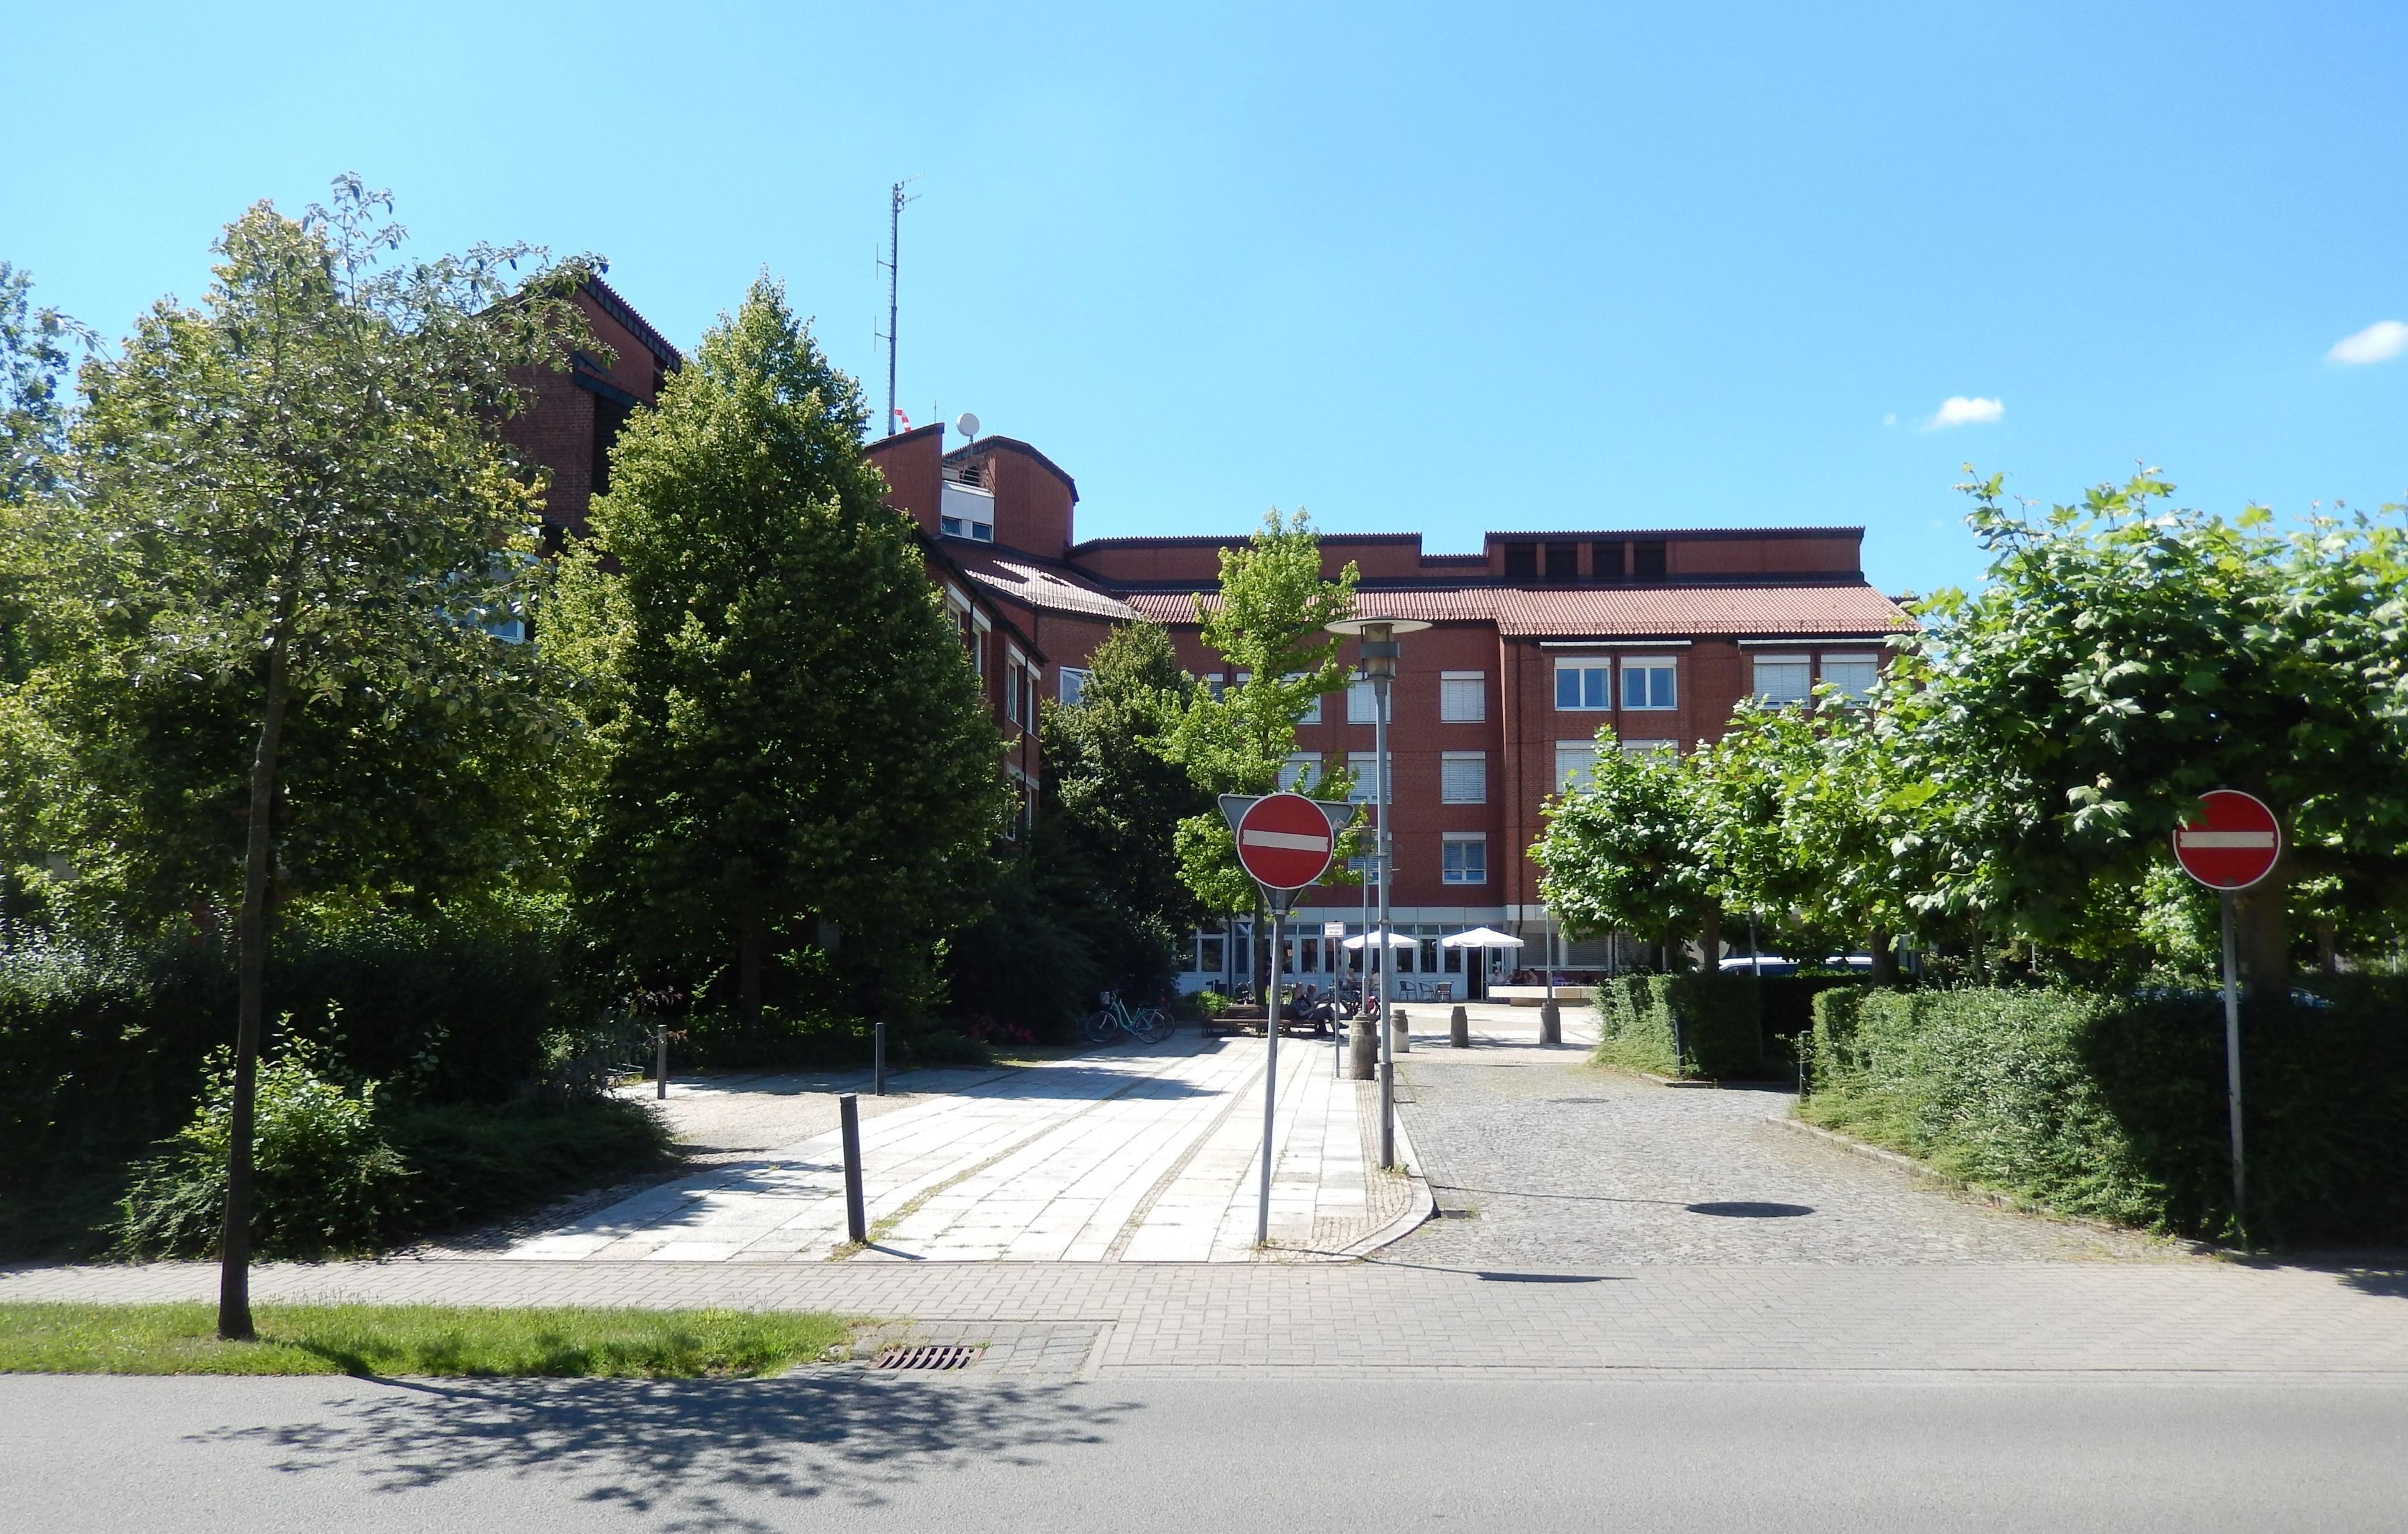 Diepholz, Dolna Saksonia, Niemcy